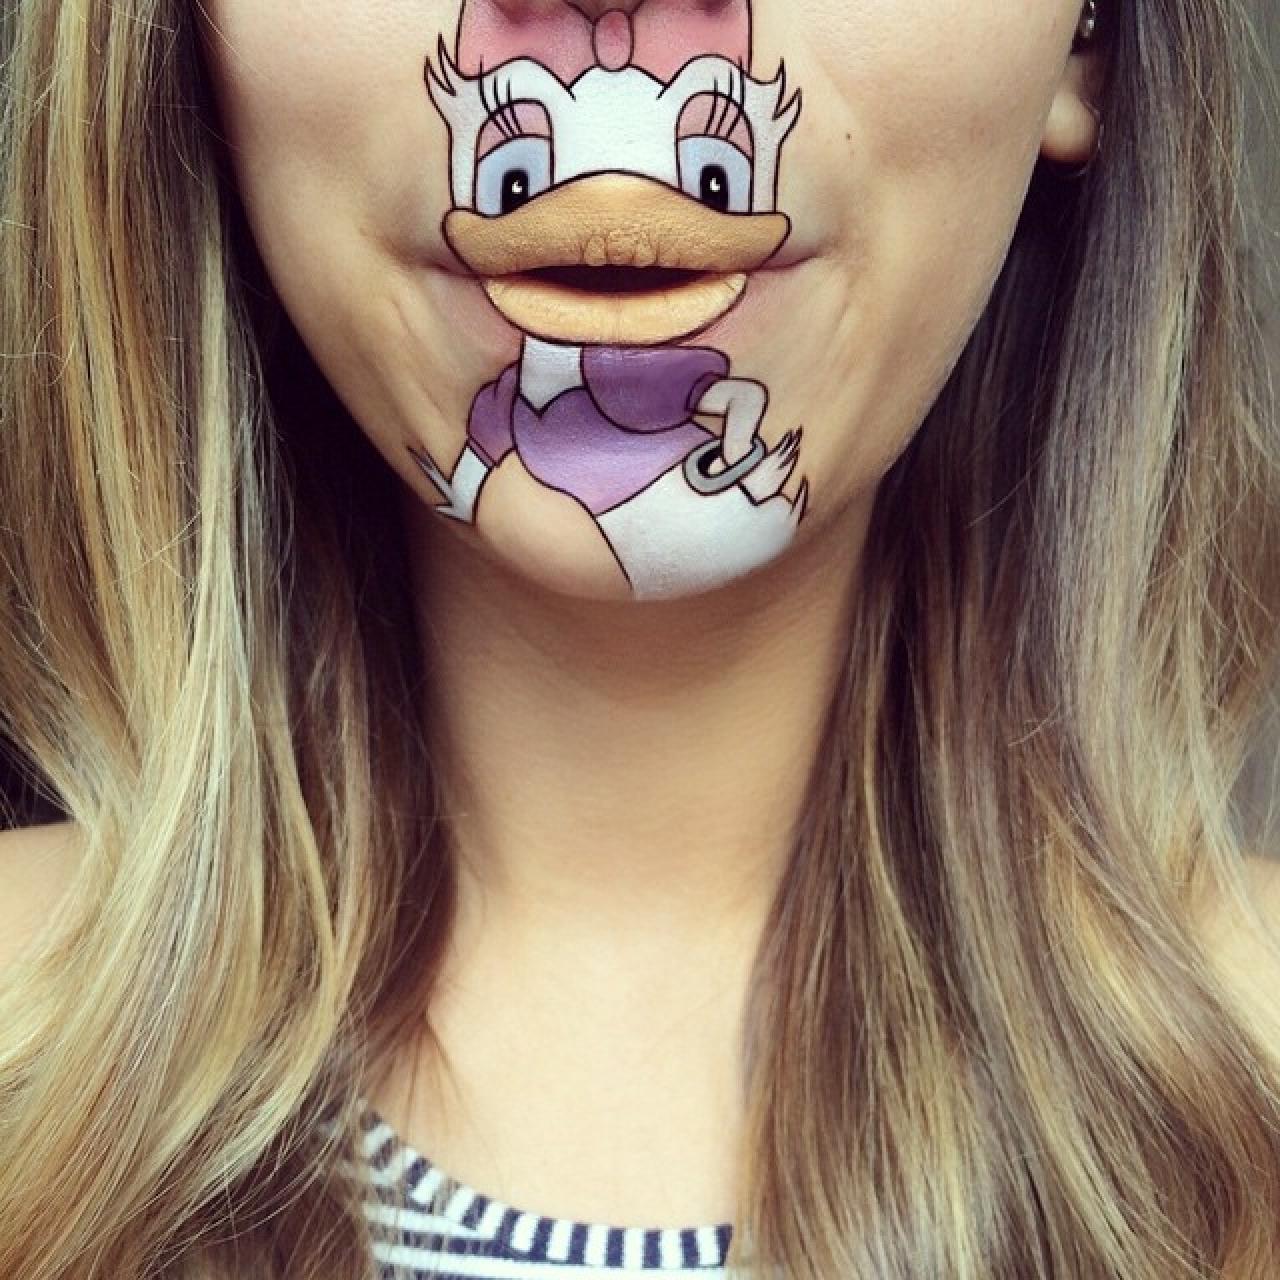 Amazing Cartoon Lip-Art By Laura Jenkinson 21